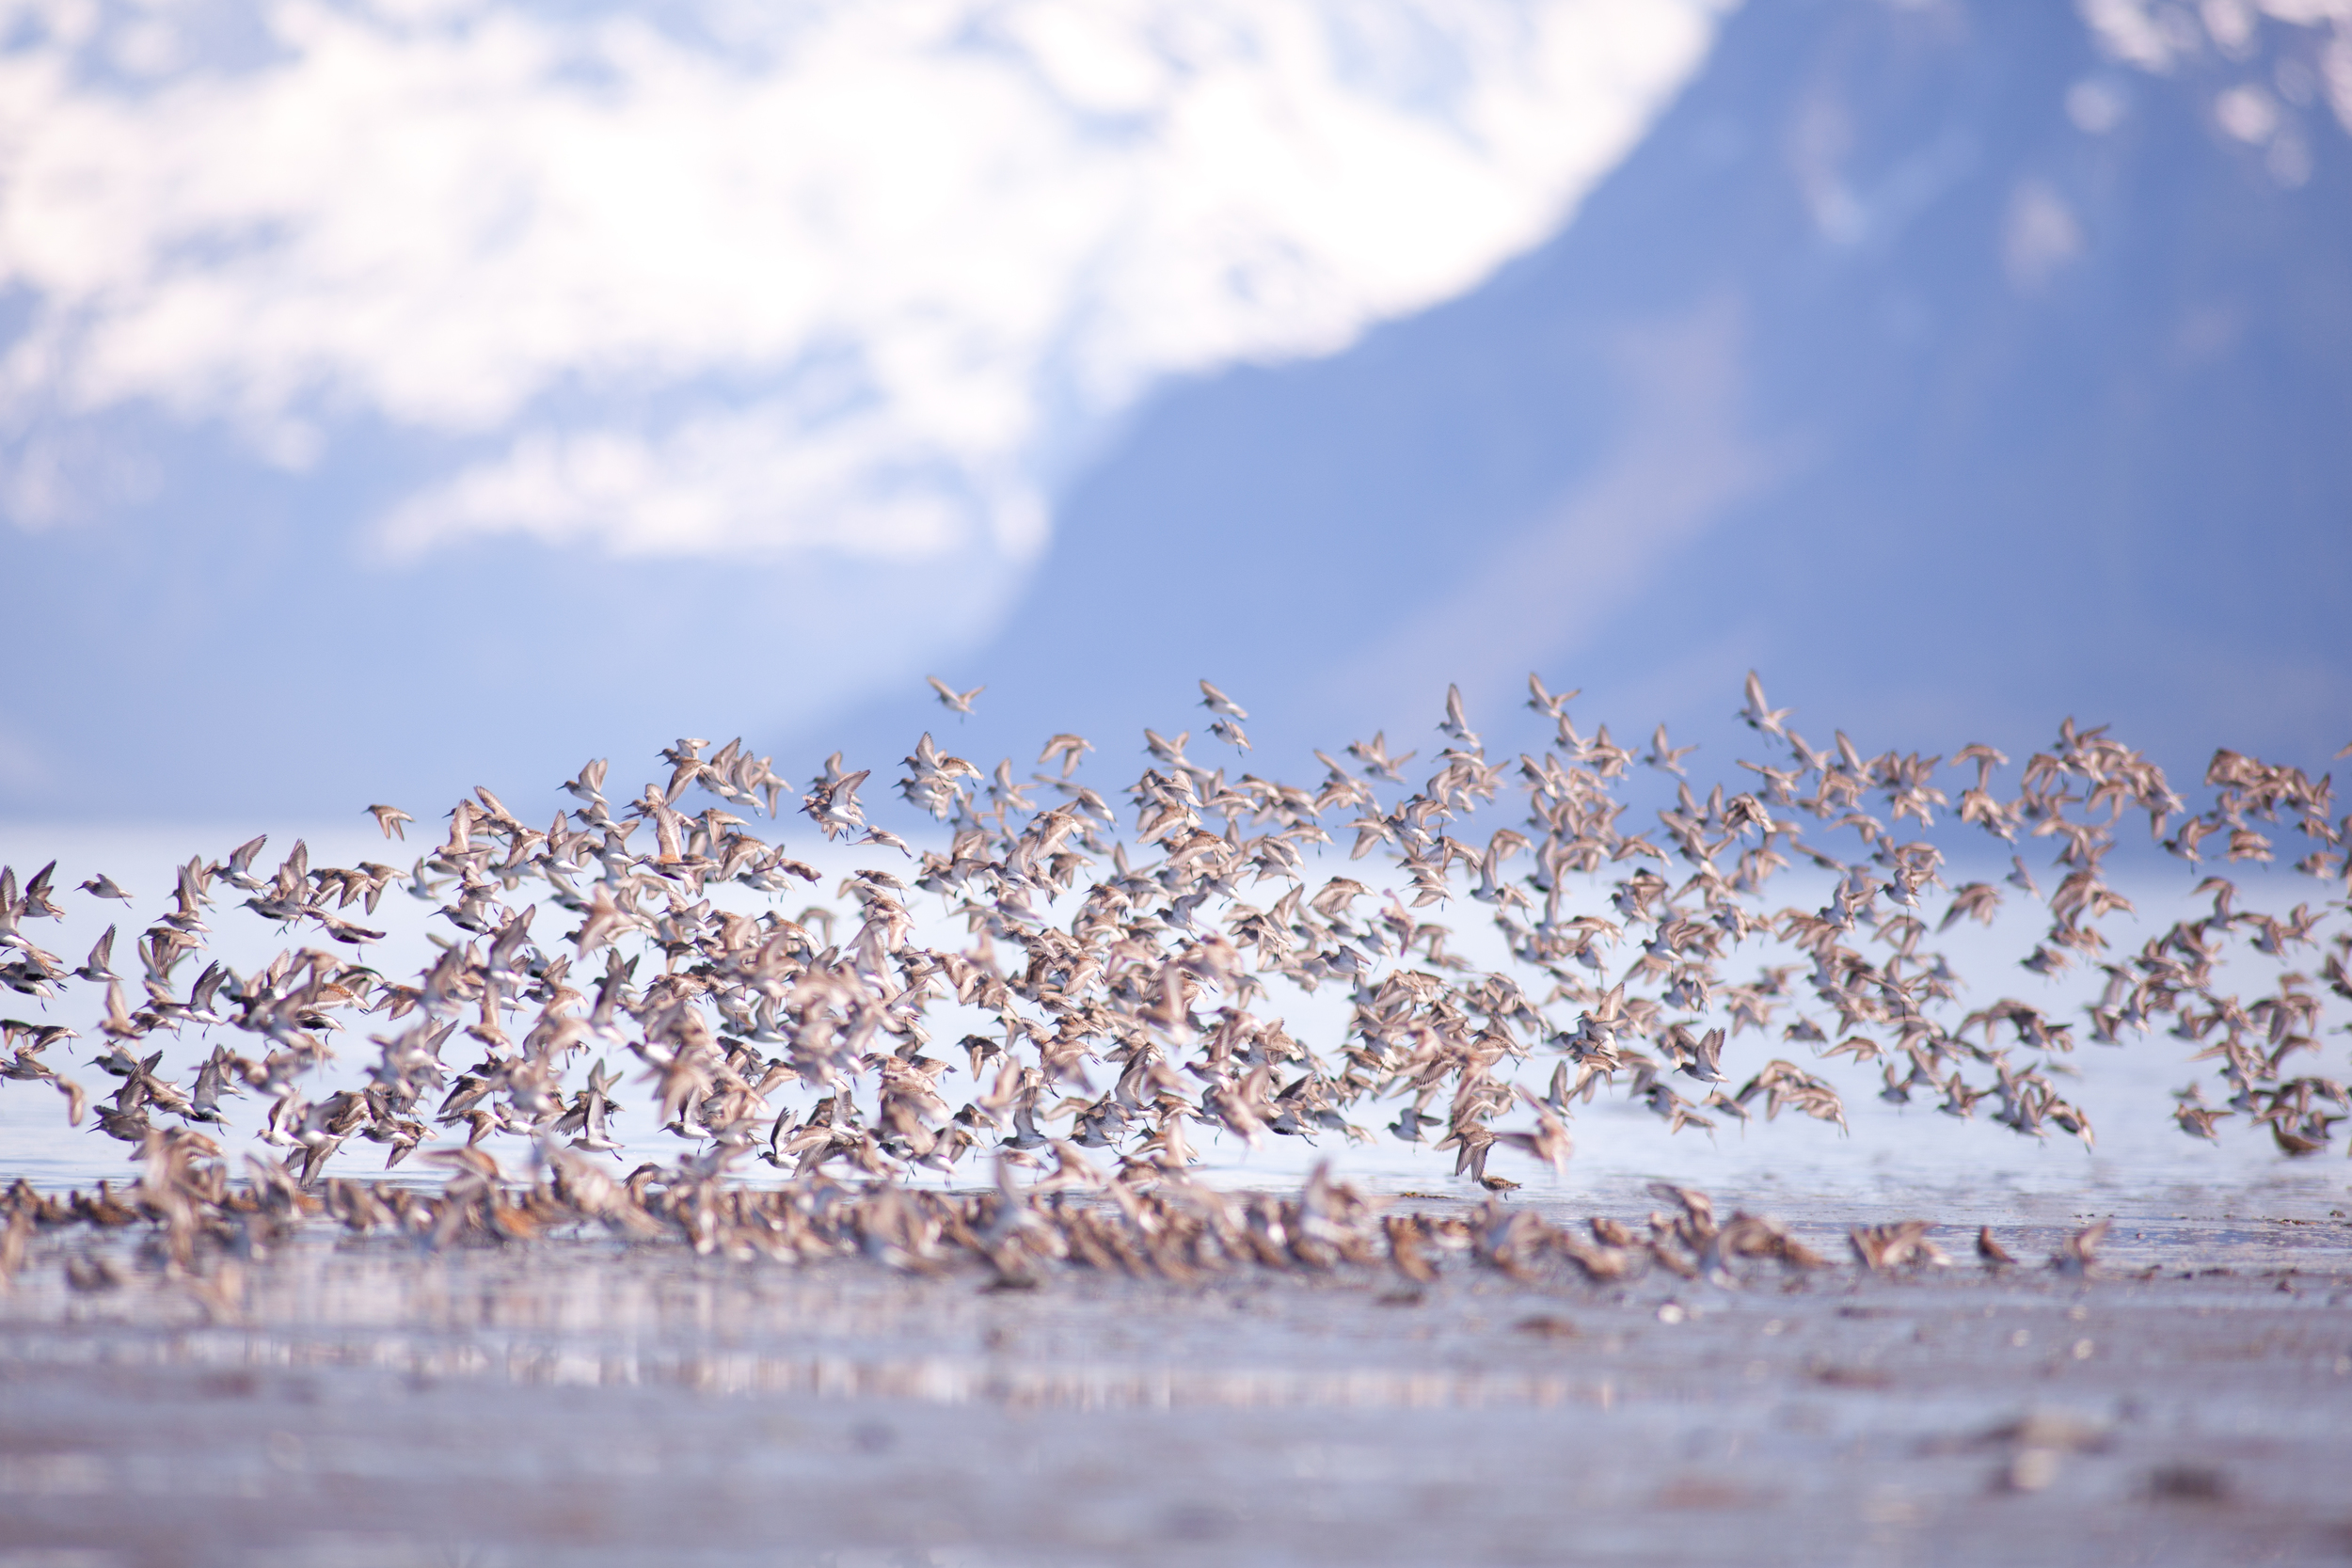 HaismanPhotography_ShorebirdFestival2014-1565.jpg